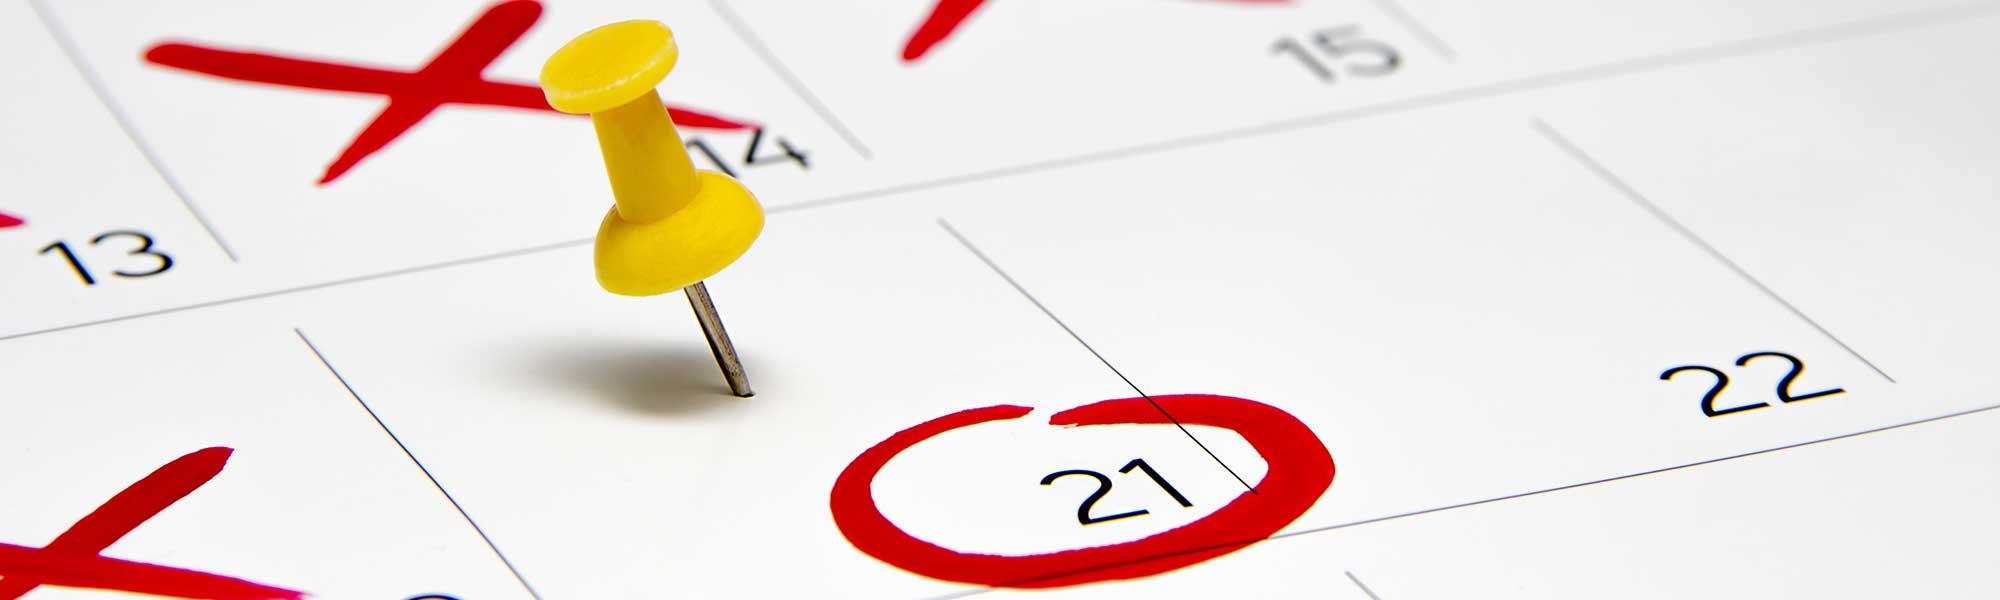 Important dates - L-Università ta' Malta